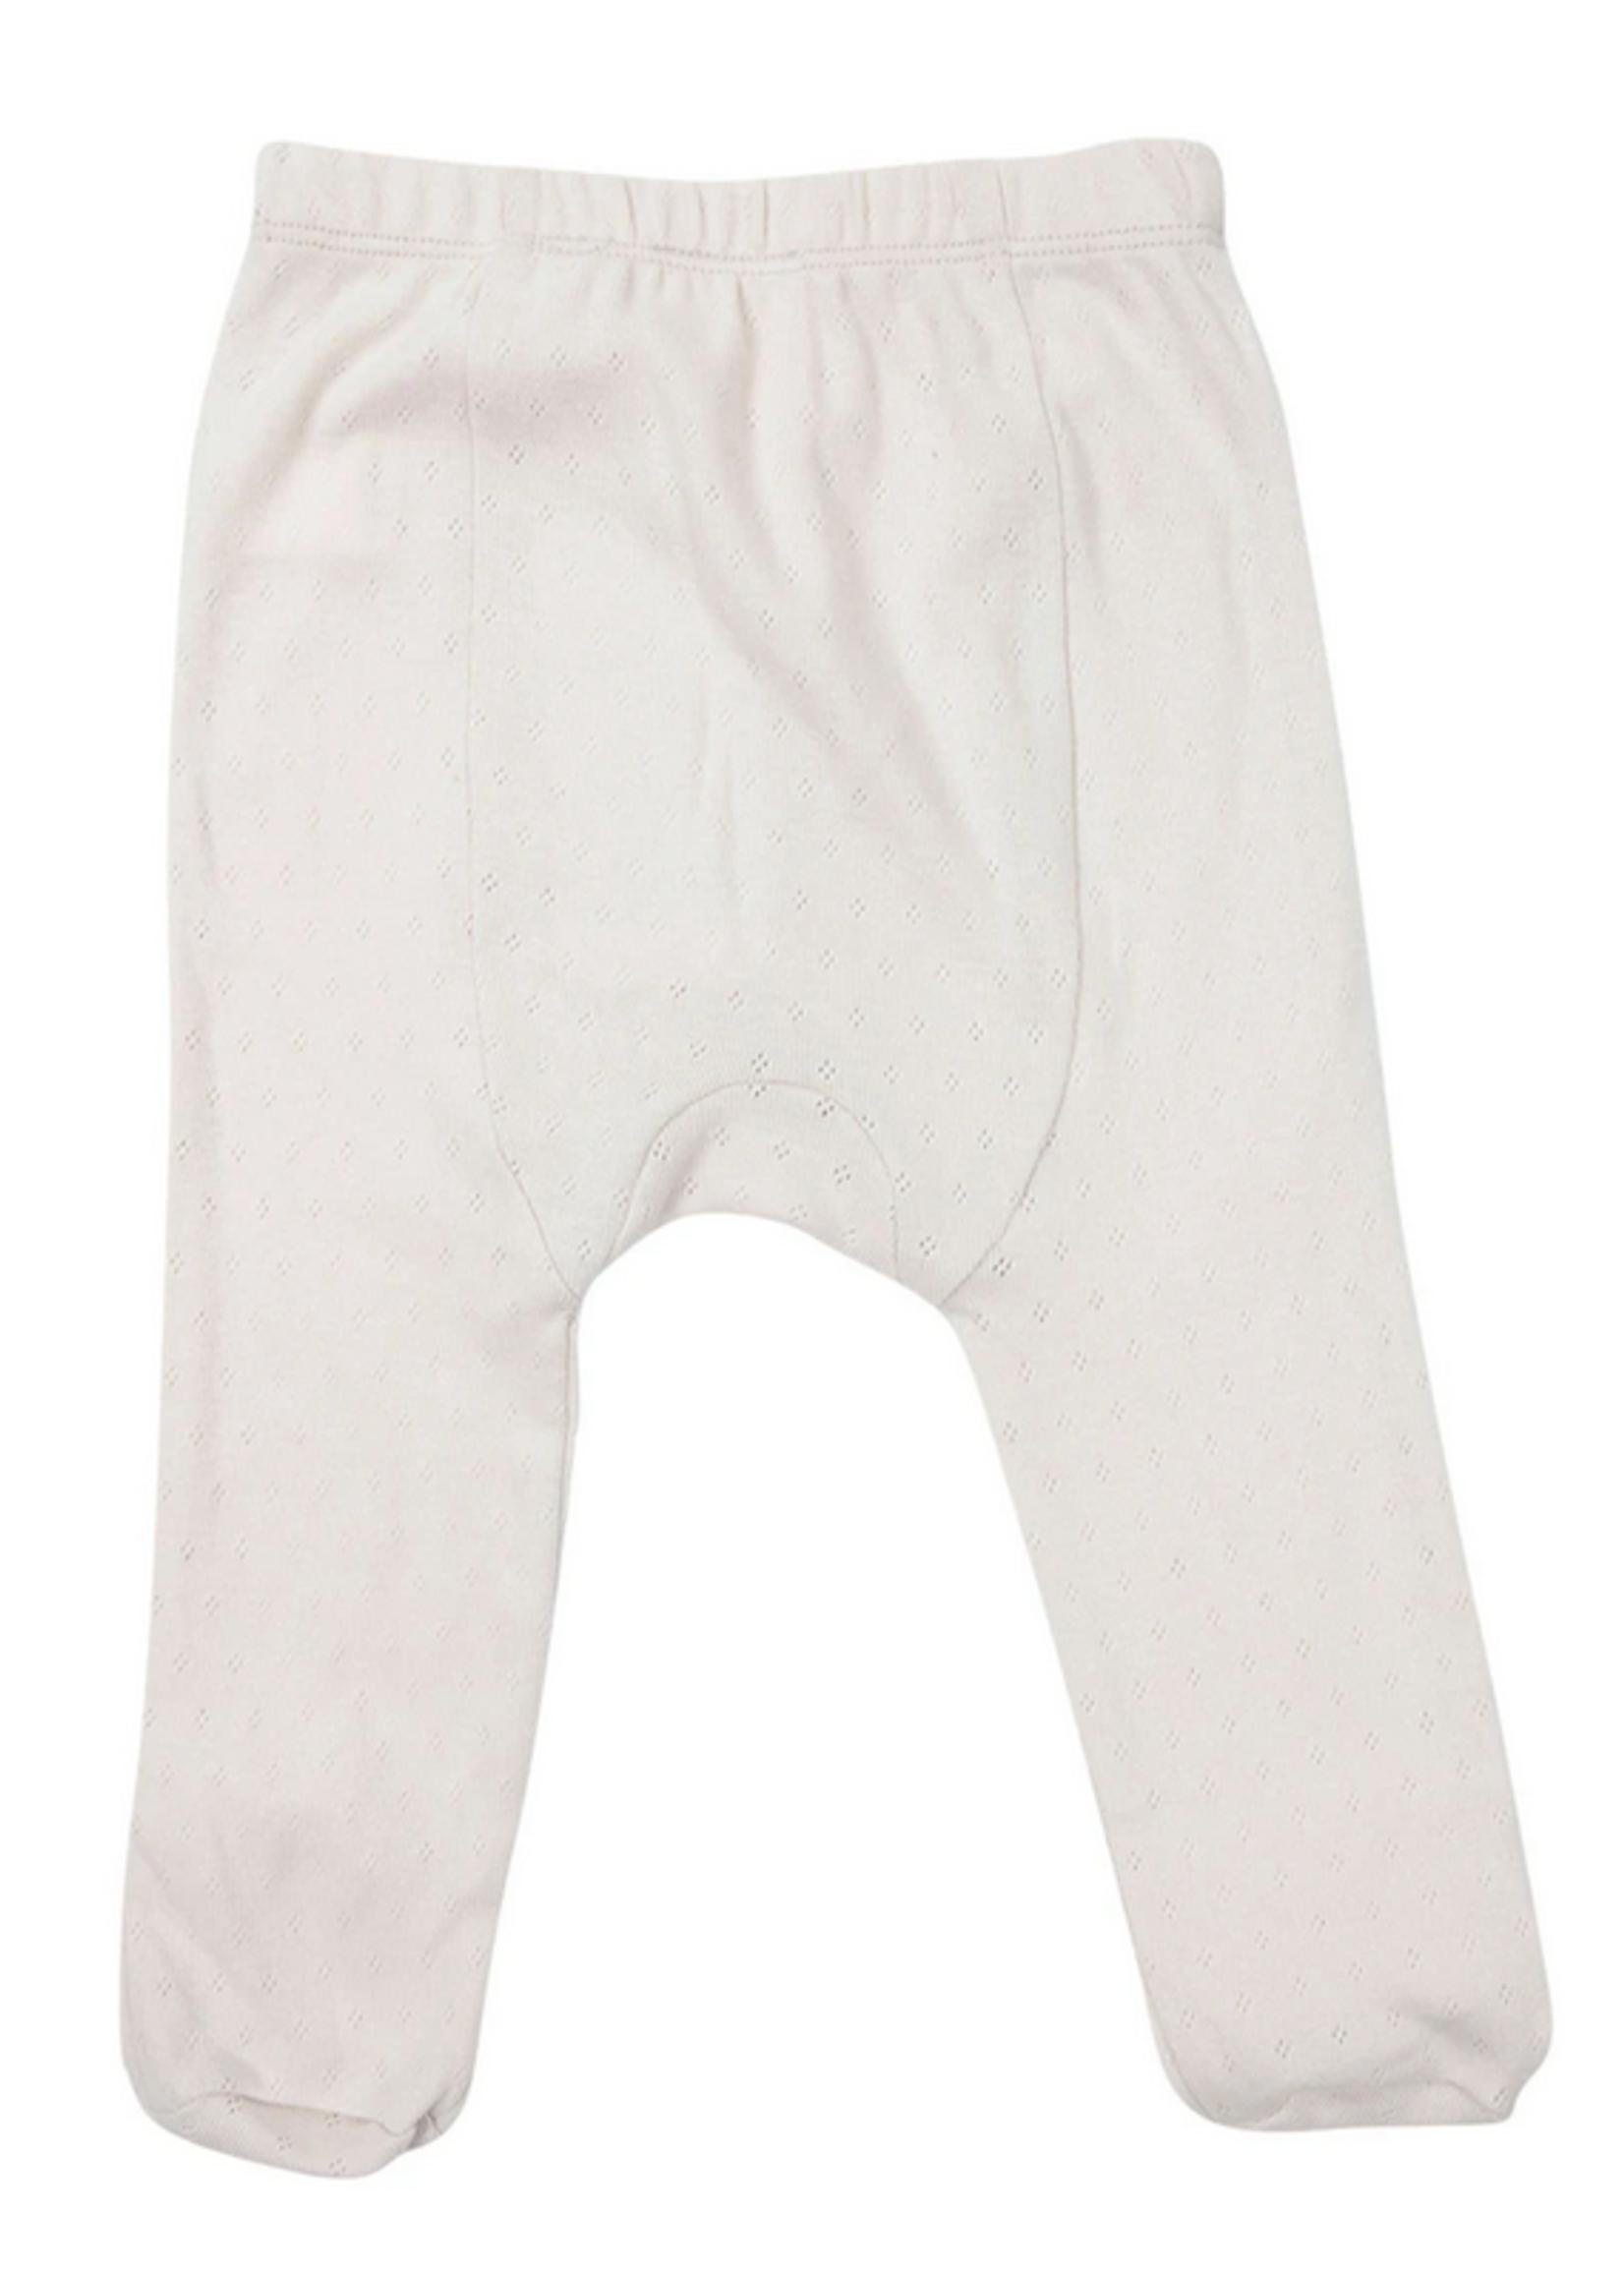 Elitaire Petite Organic Baby Legging in Grey